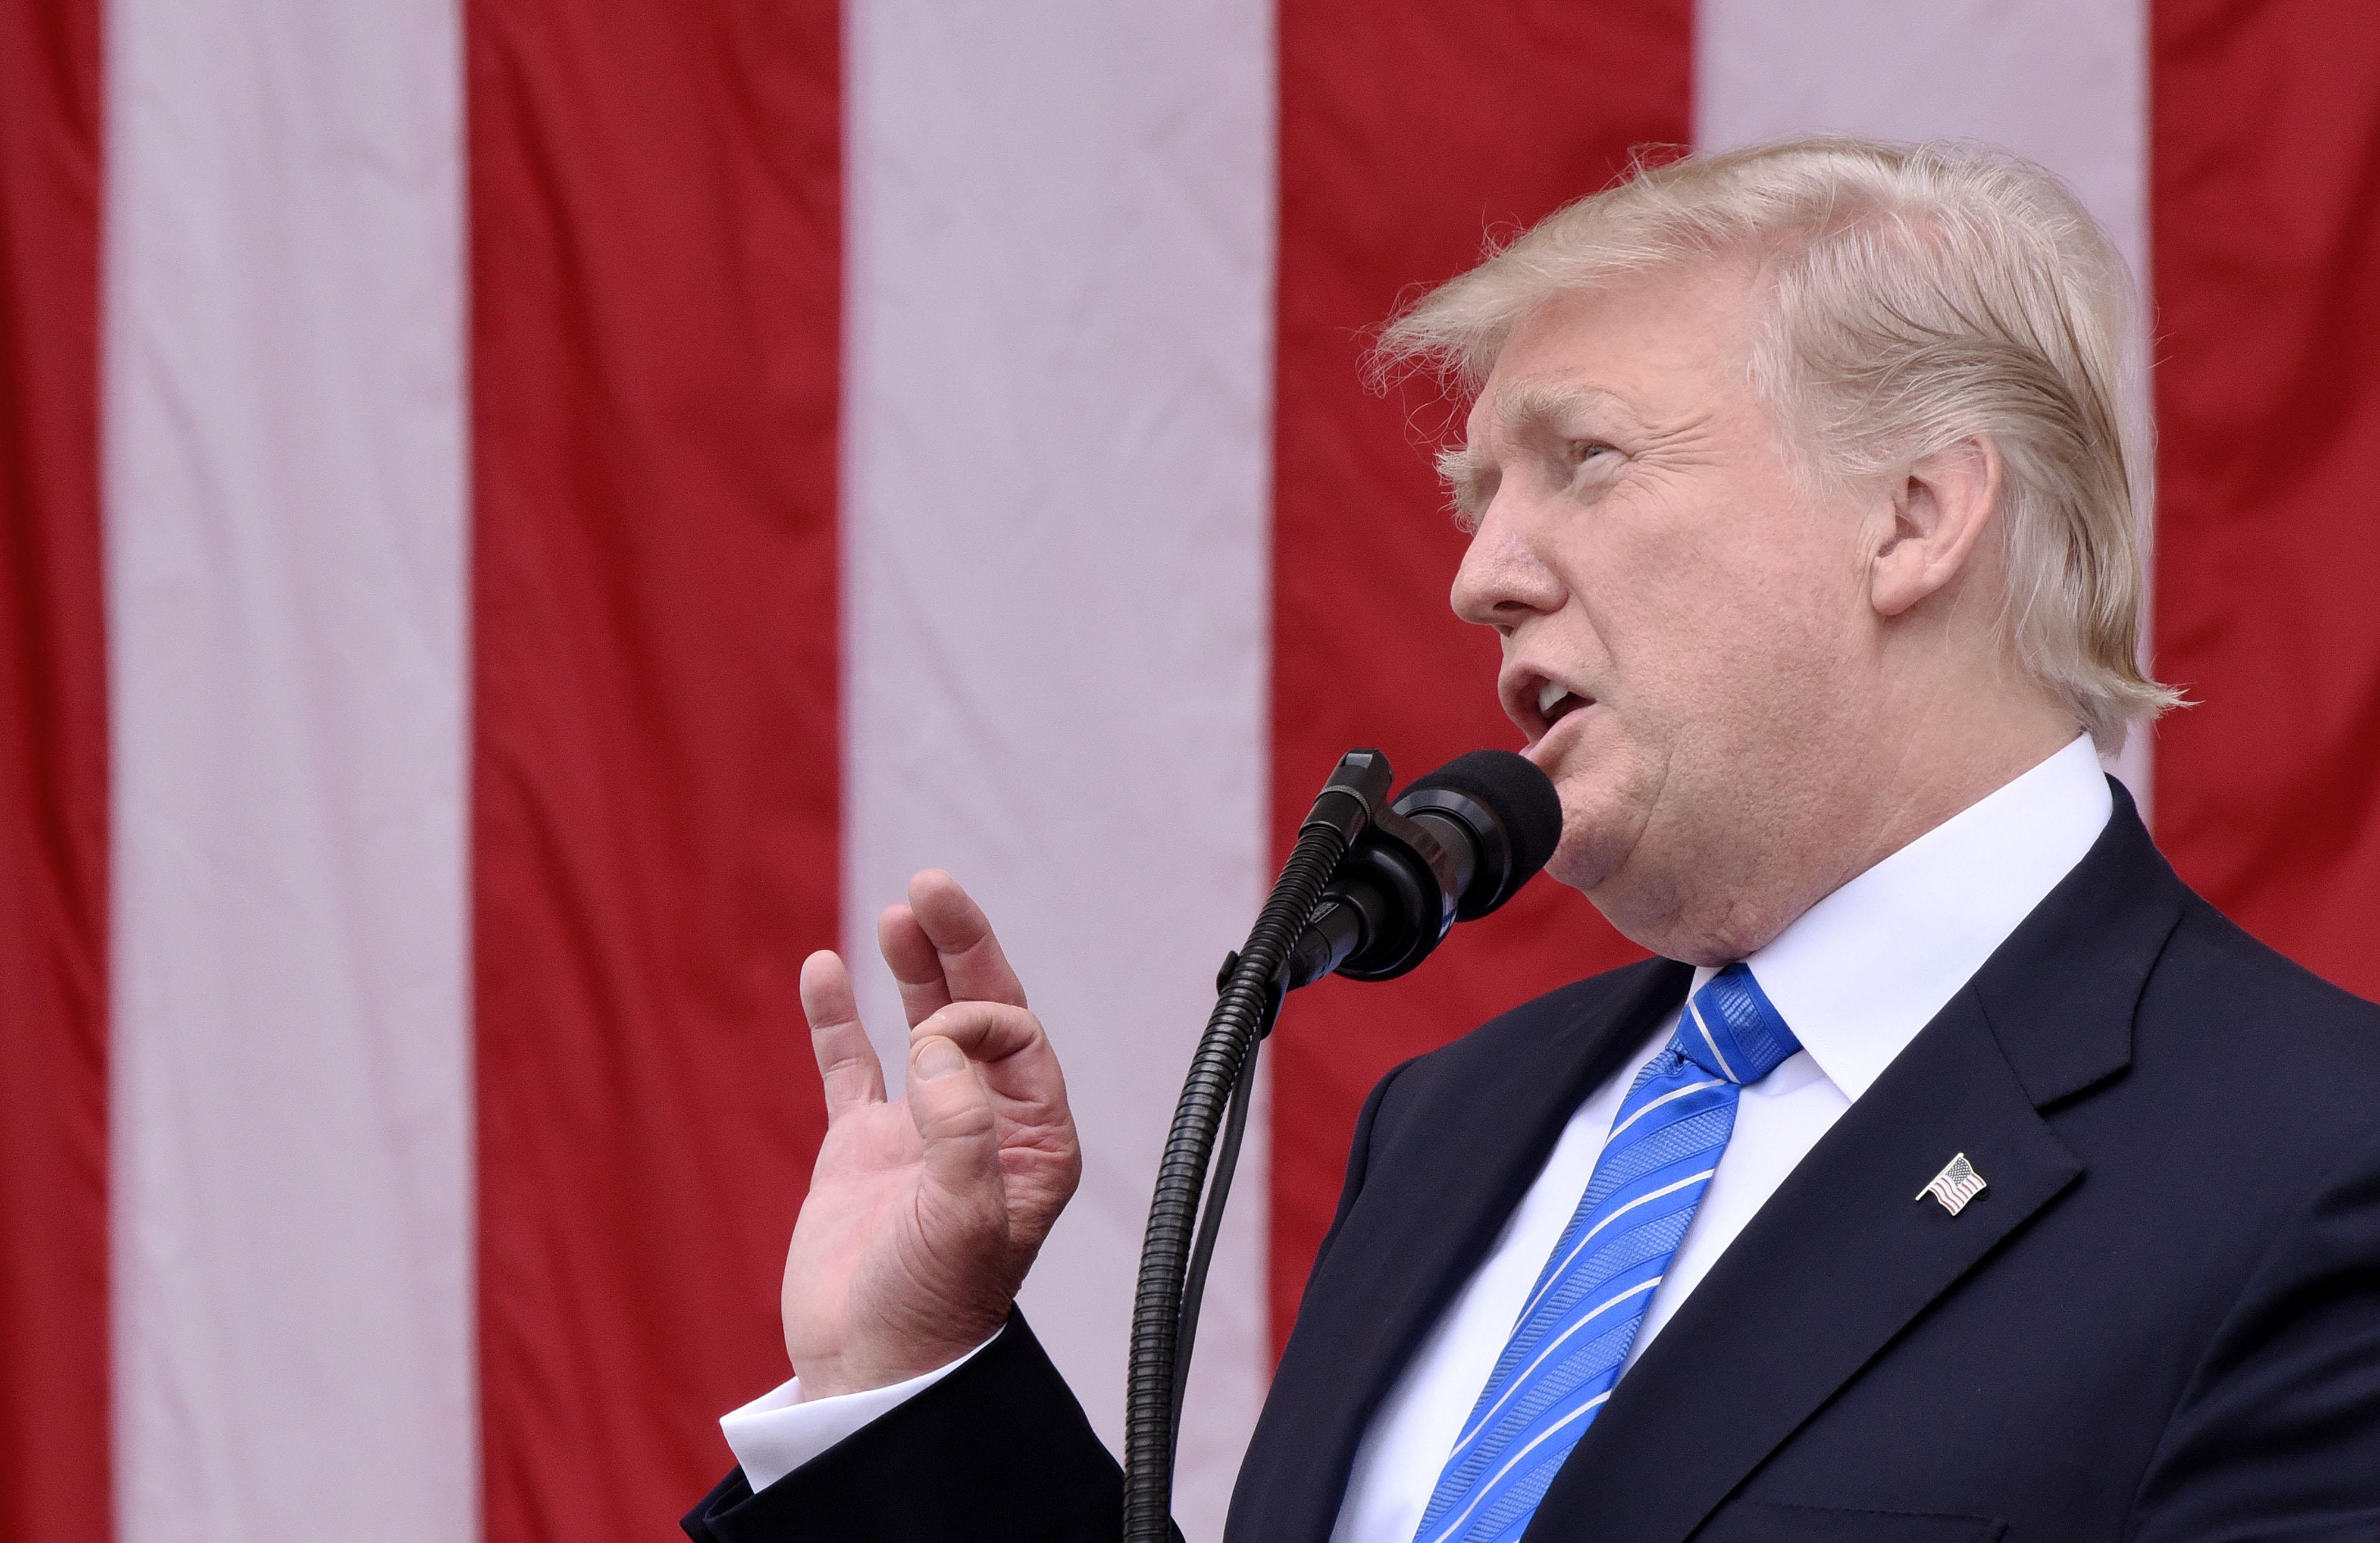 President Trump Visits Arlington National Cemetery On Memorial Day